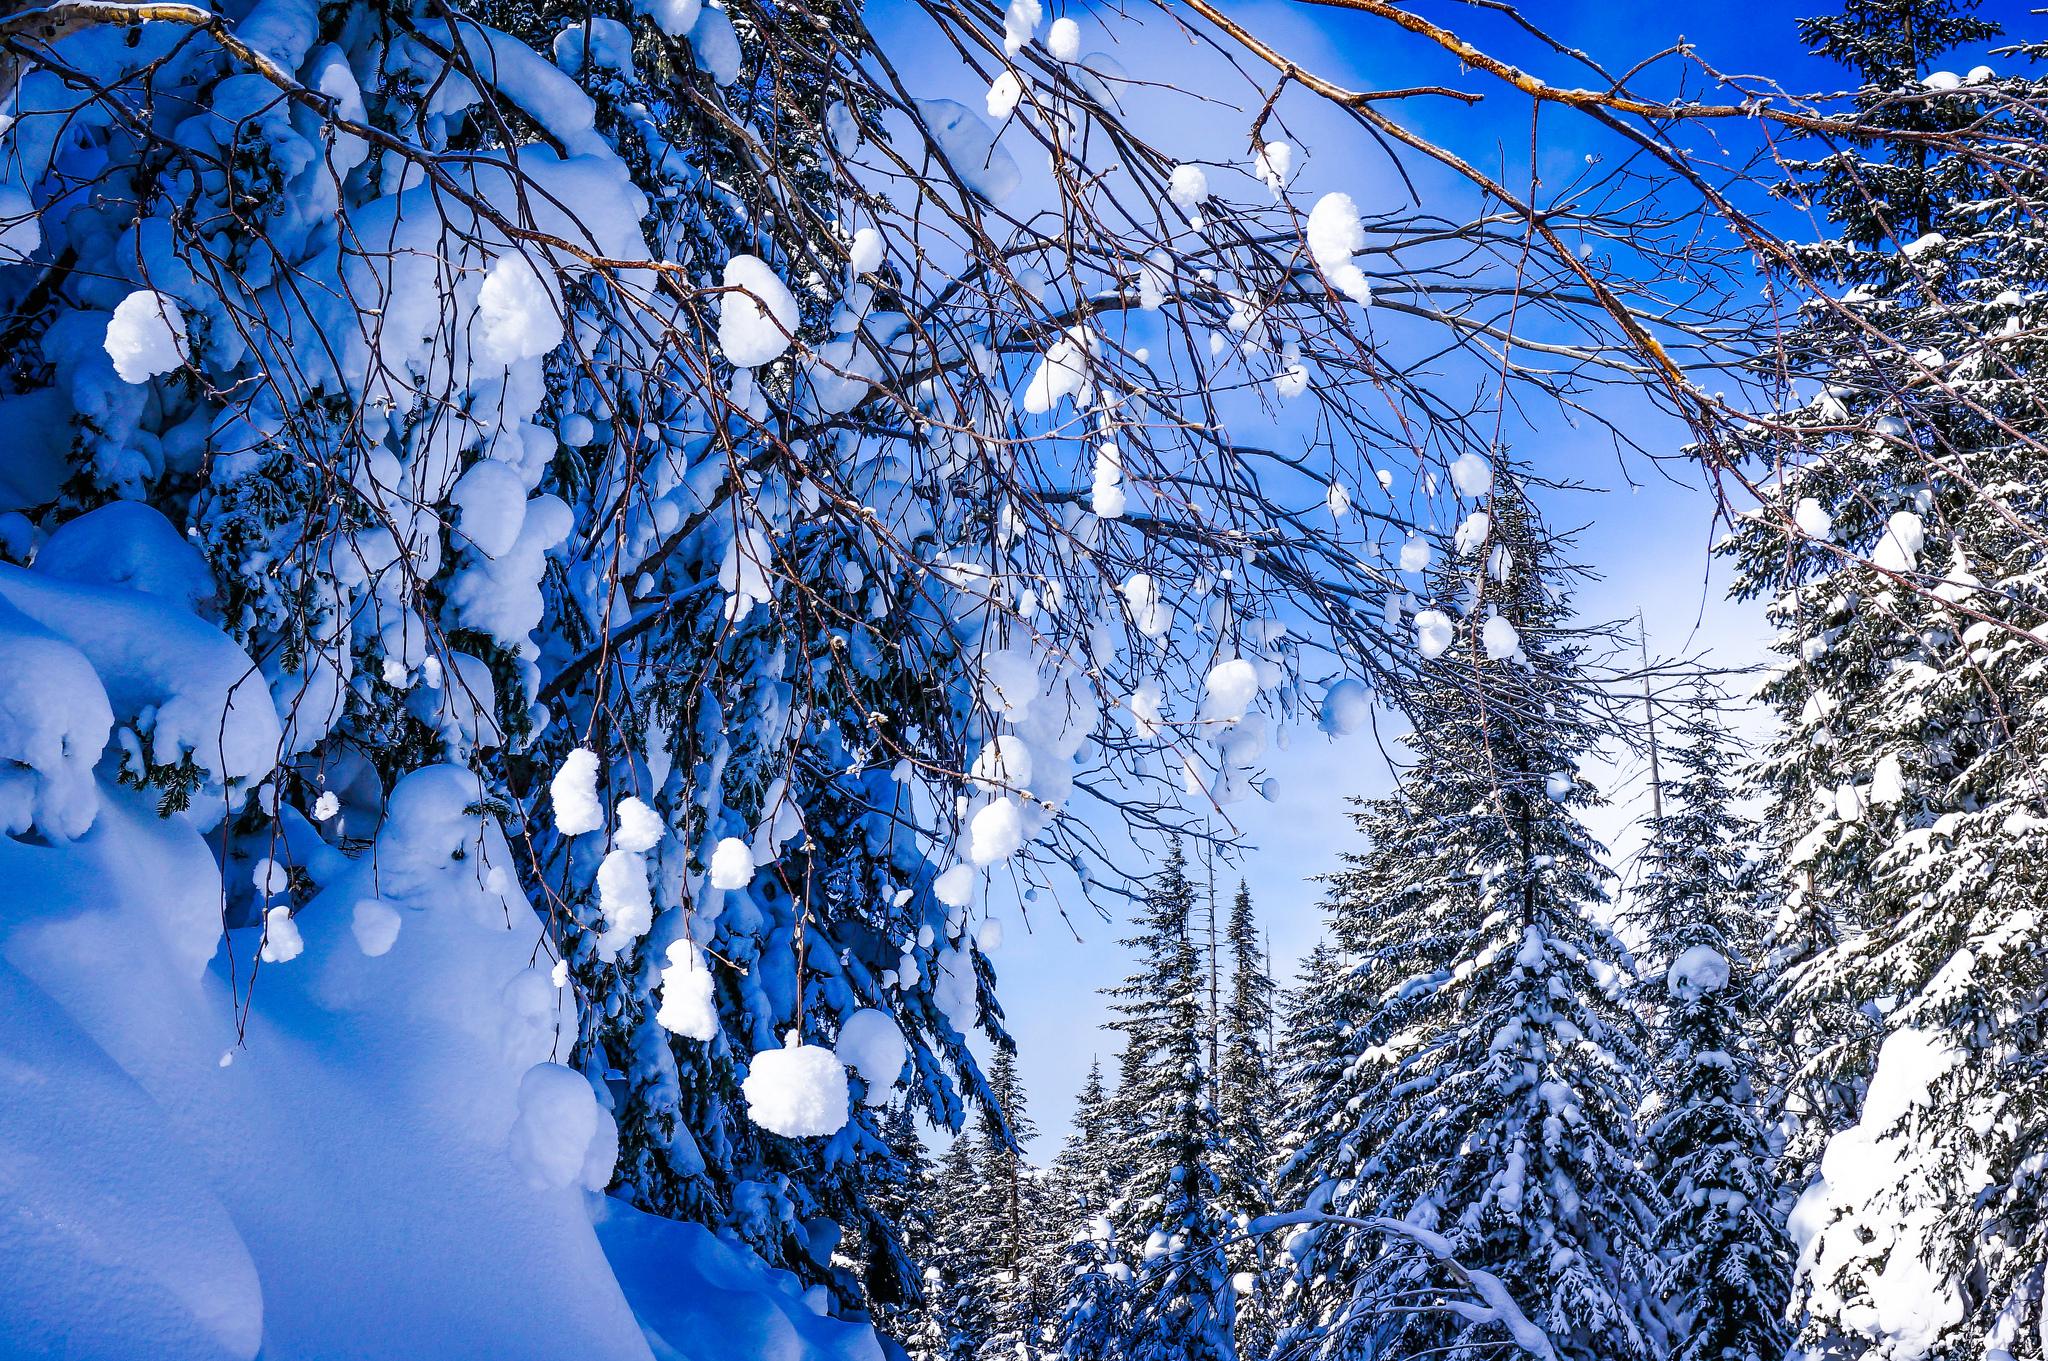 снег ветви лес snow branches forest  № 442873 бесплатно